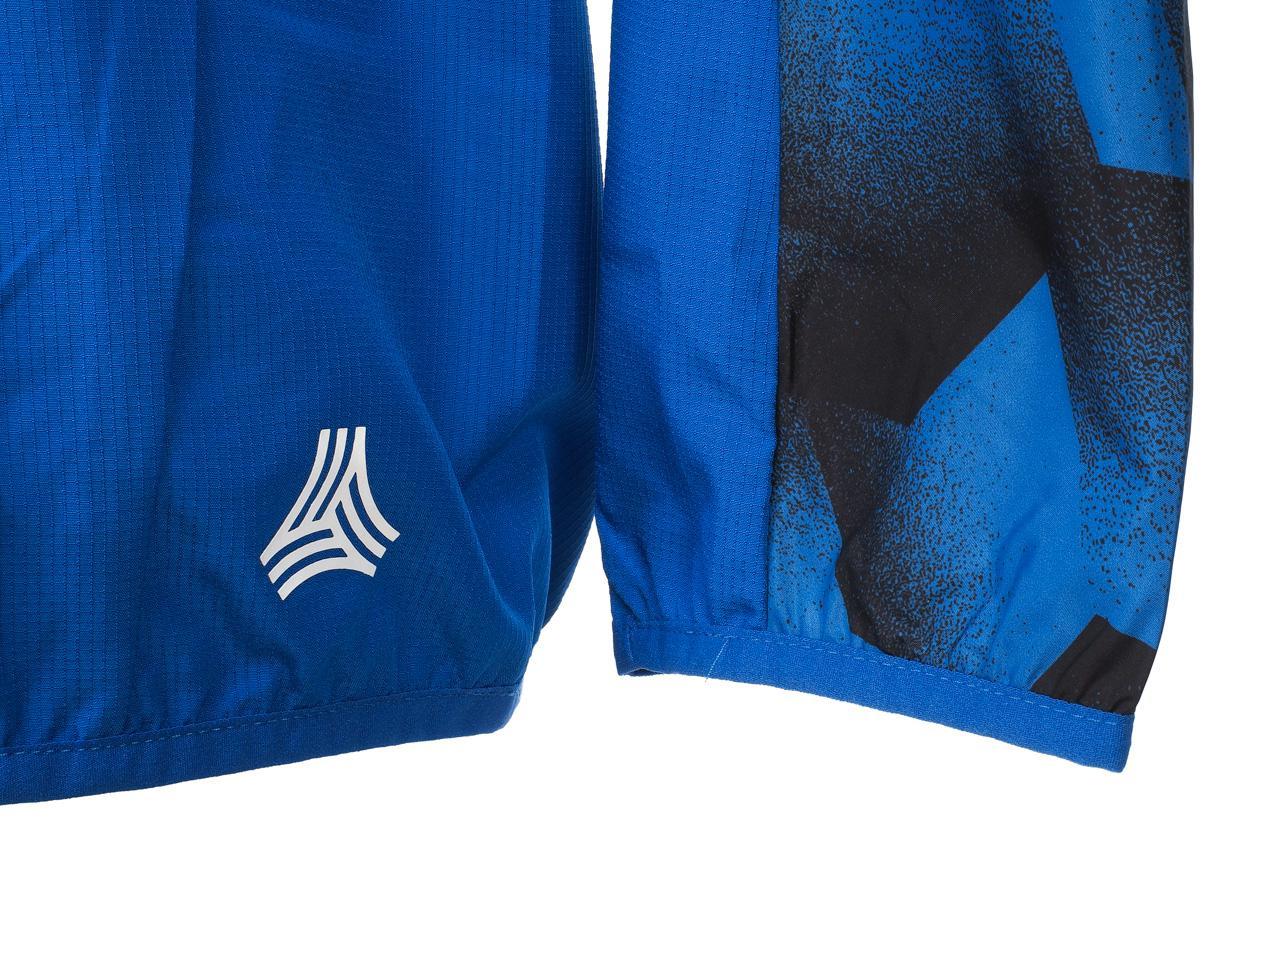 Jacken-Von-Jogginganzug-Tracktops-Adidas-Tanc-Wov-Spur-Blau-Blau-75956-Neu Indexbild 4